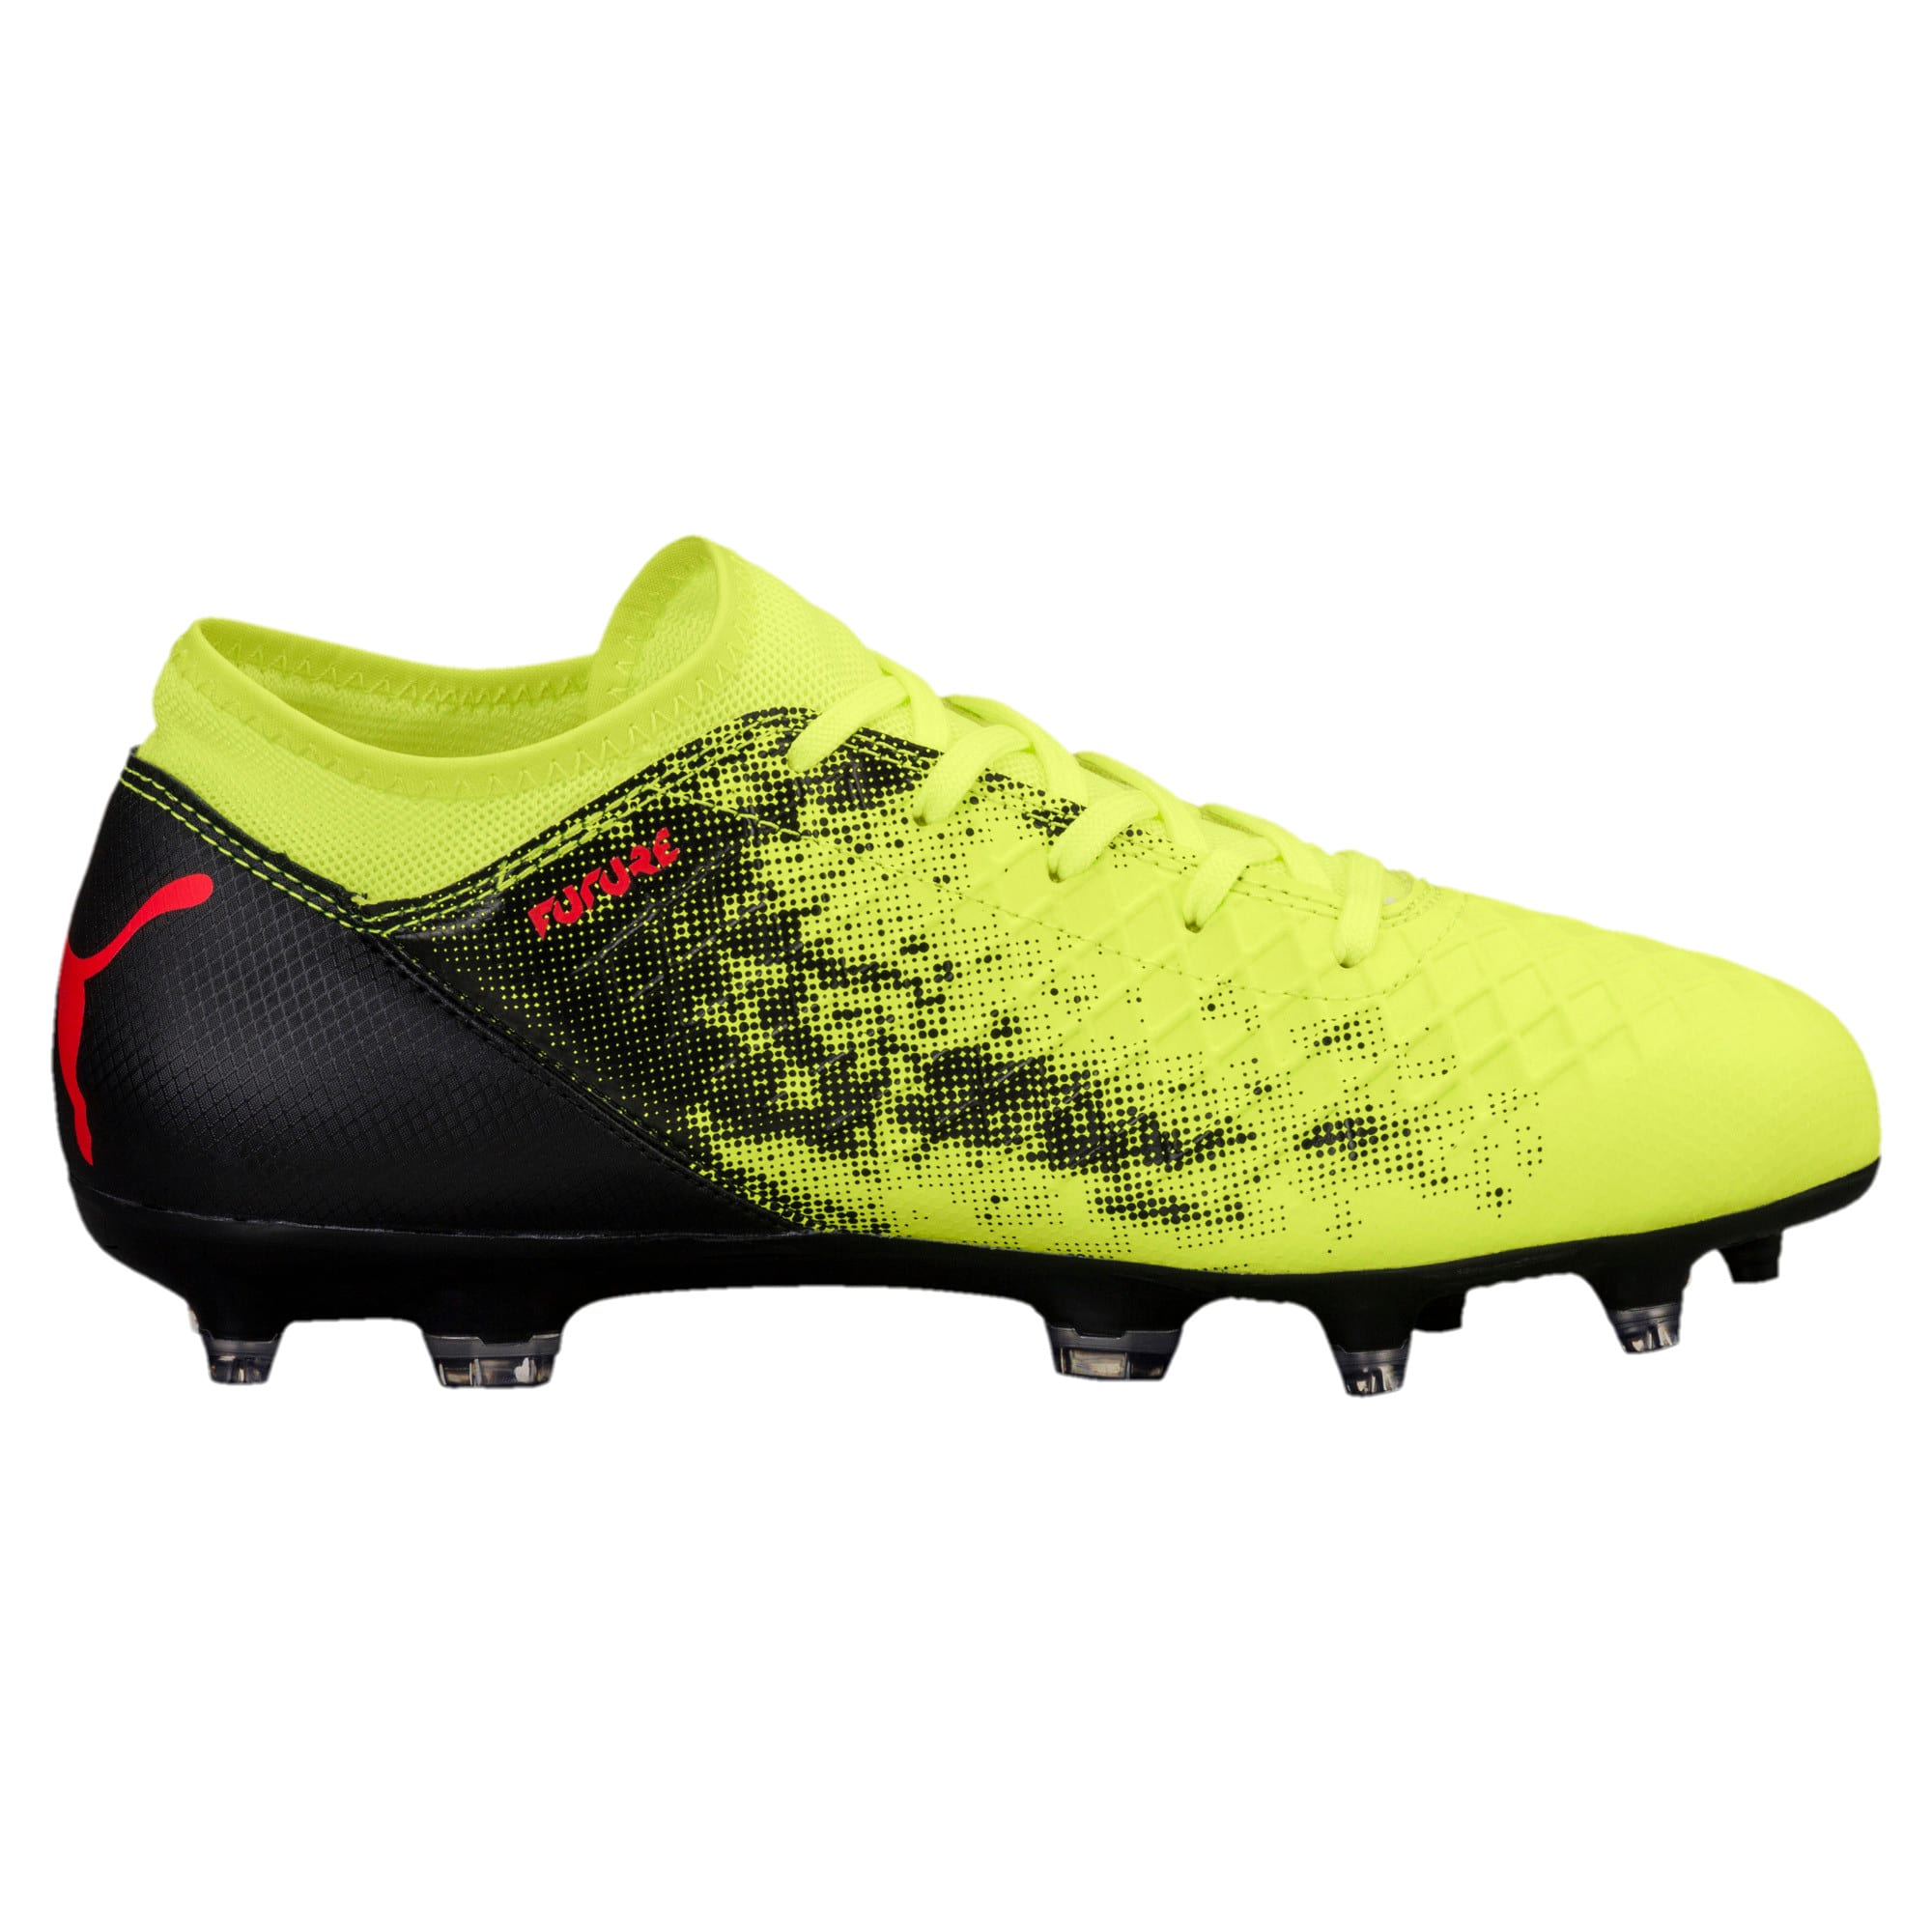 Thumbnail 4 of FUTURE 18.4 FG/AG Jr Football Boots, Yellow-Red-Black, medium-IND